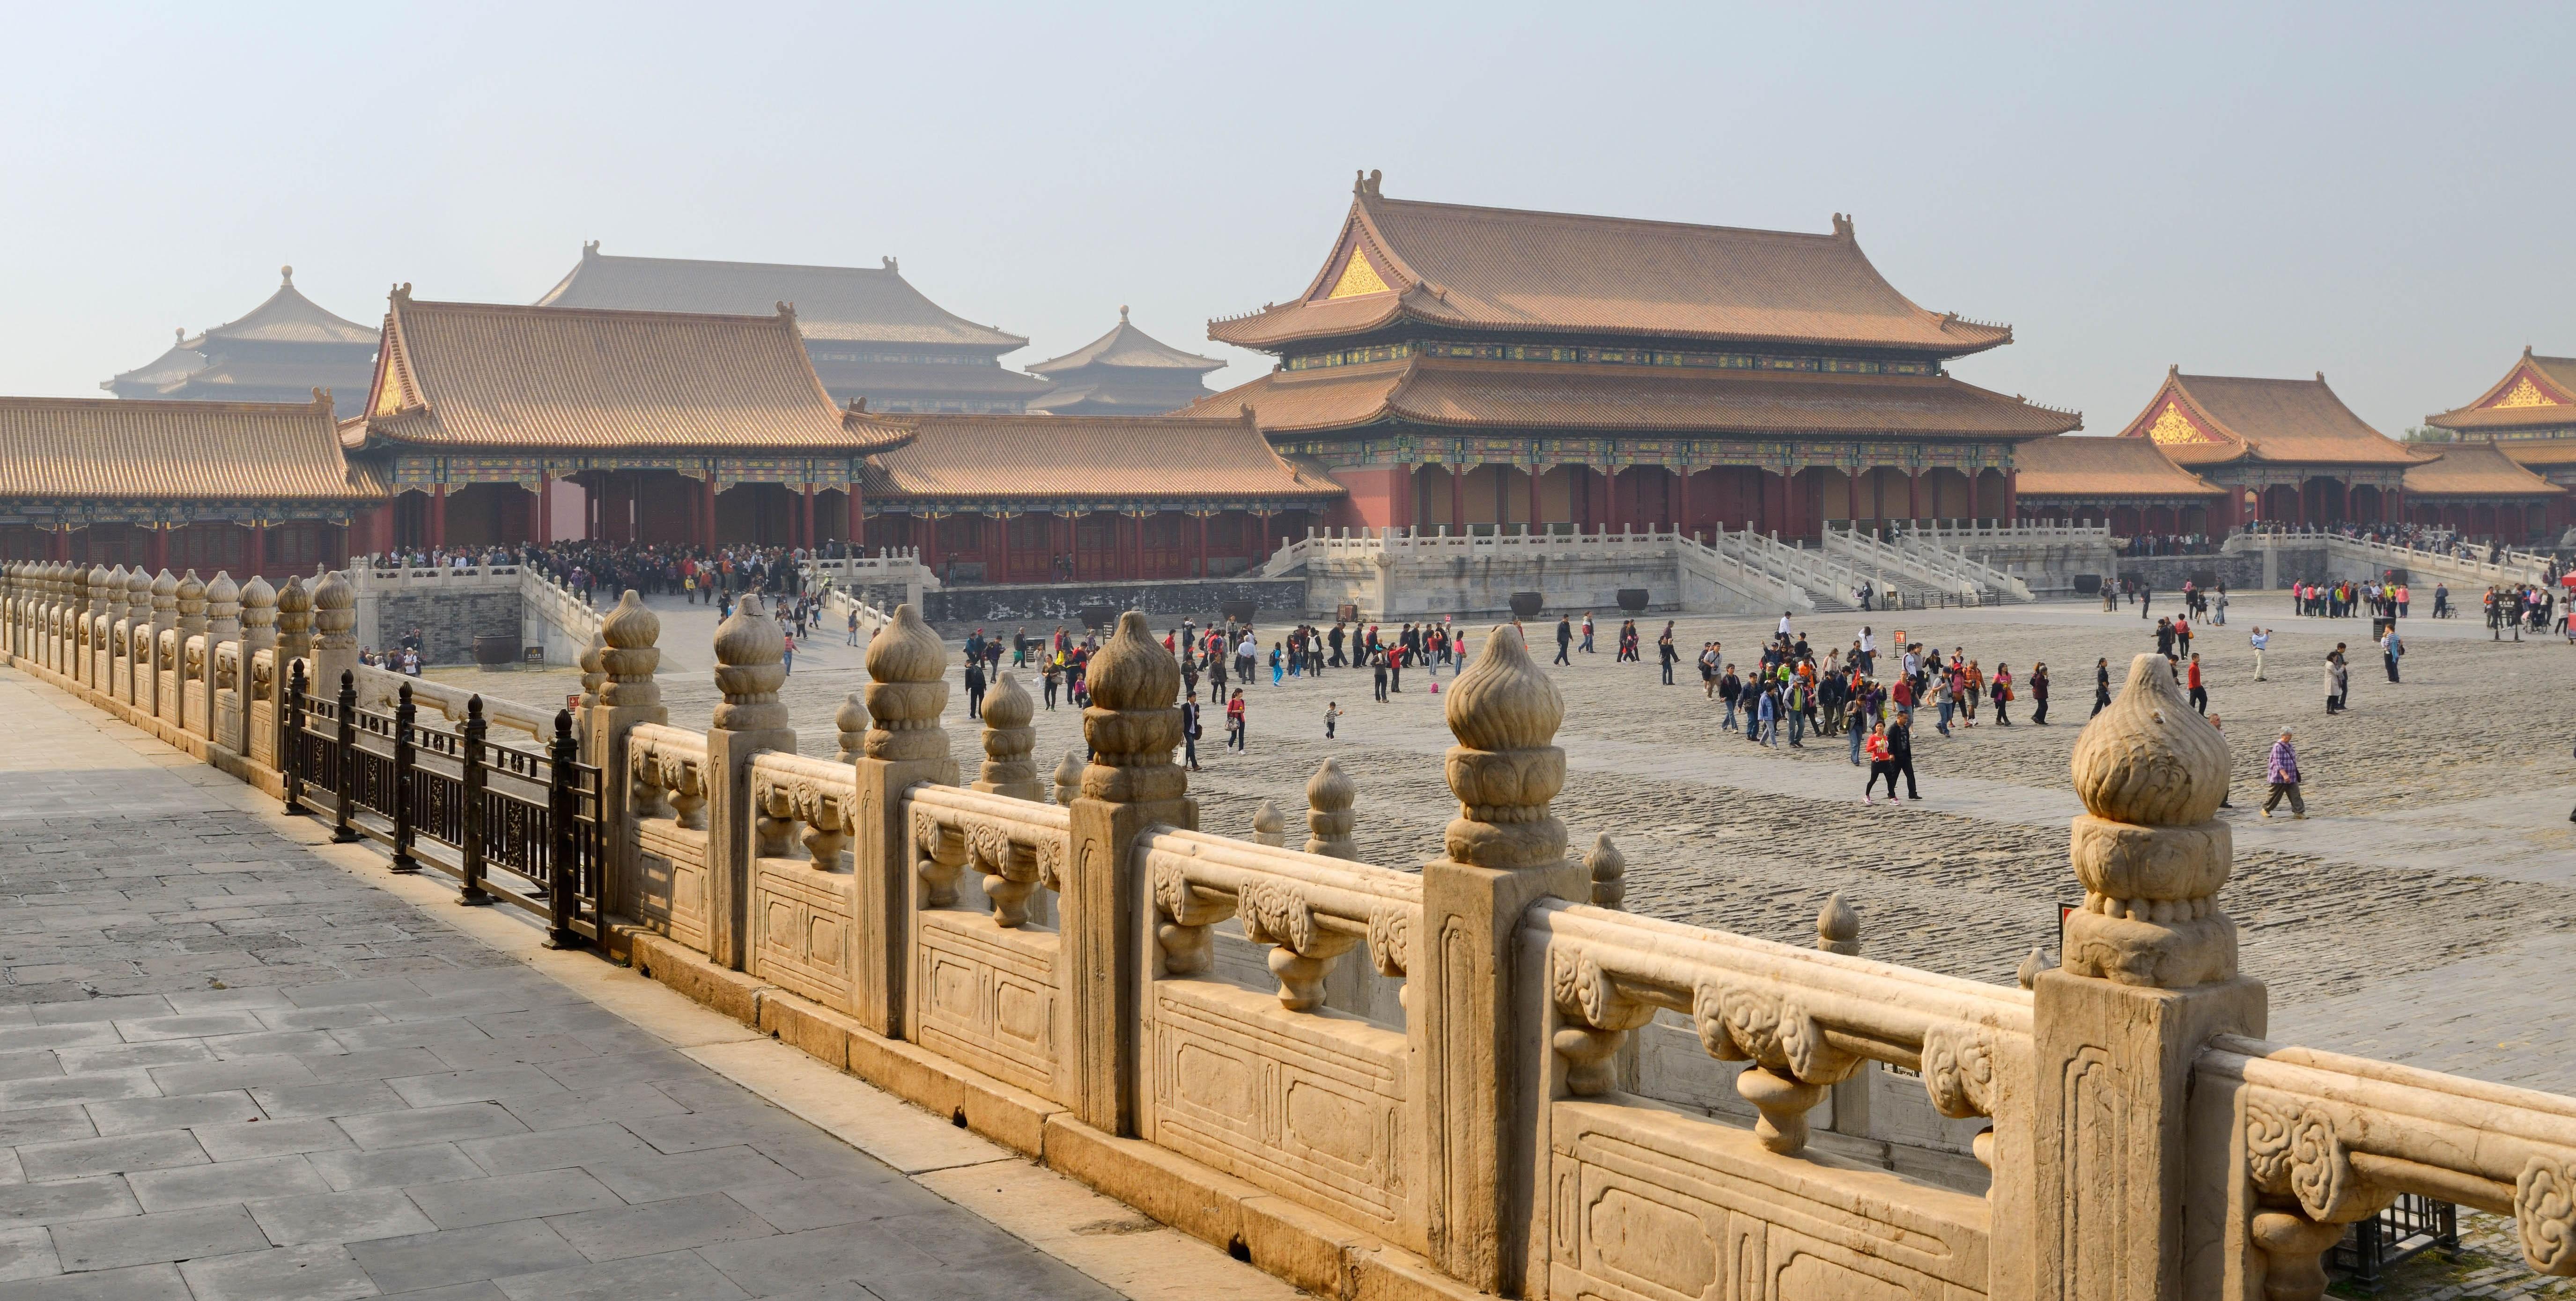 The Forbidden City is one of Beijing's most popular attractions